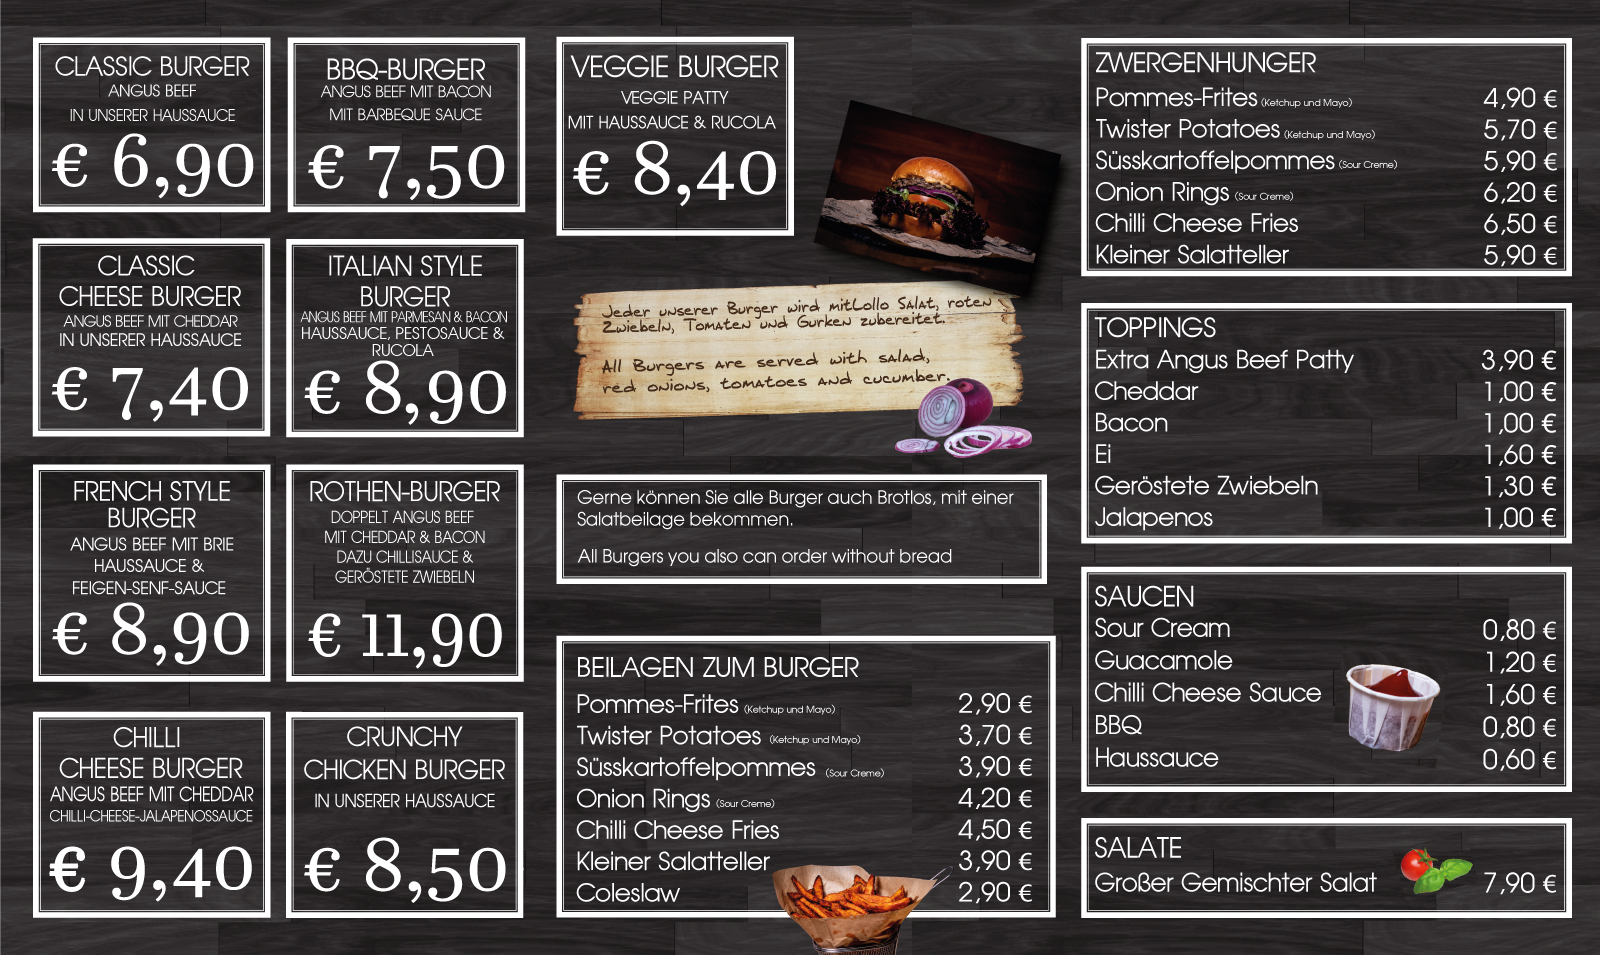 Speisekarte für Burgerlokal